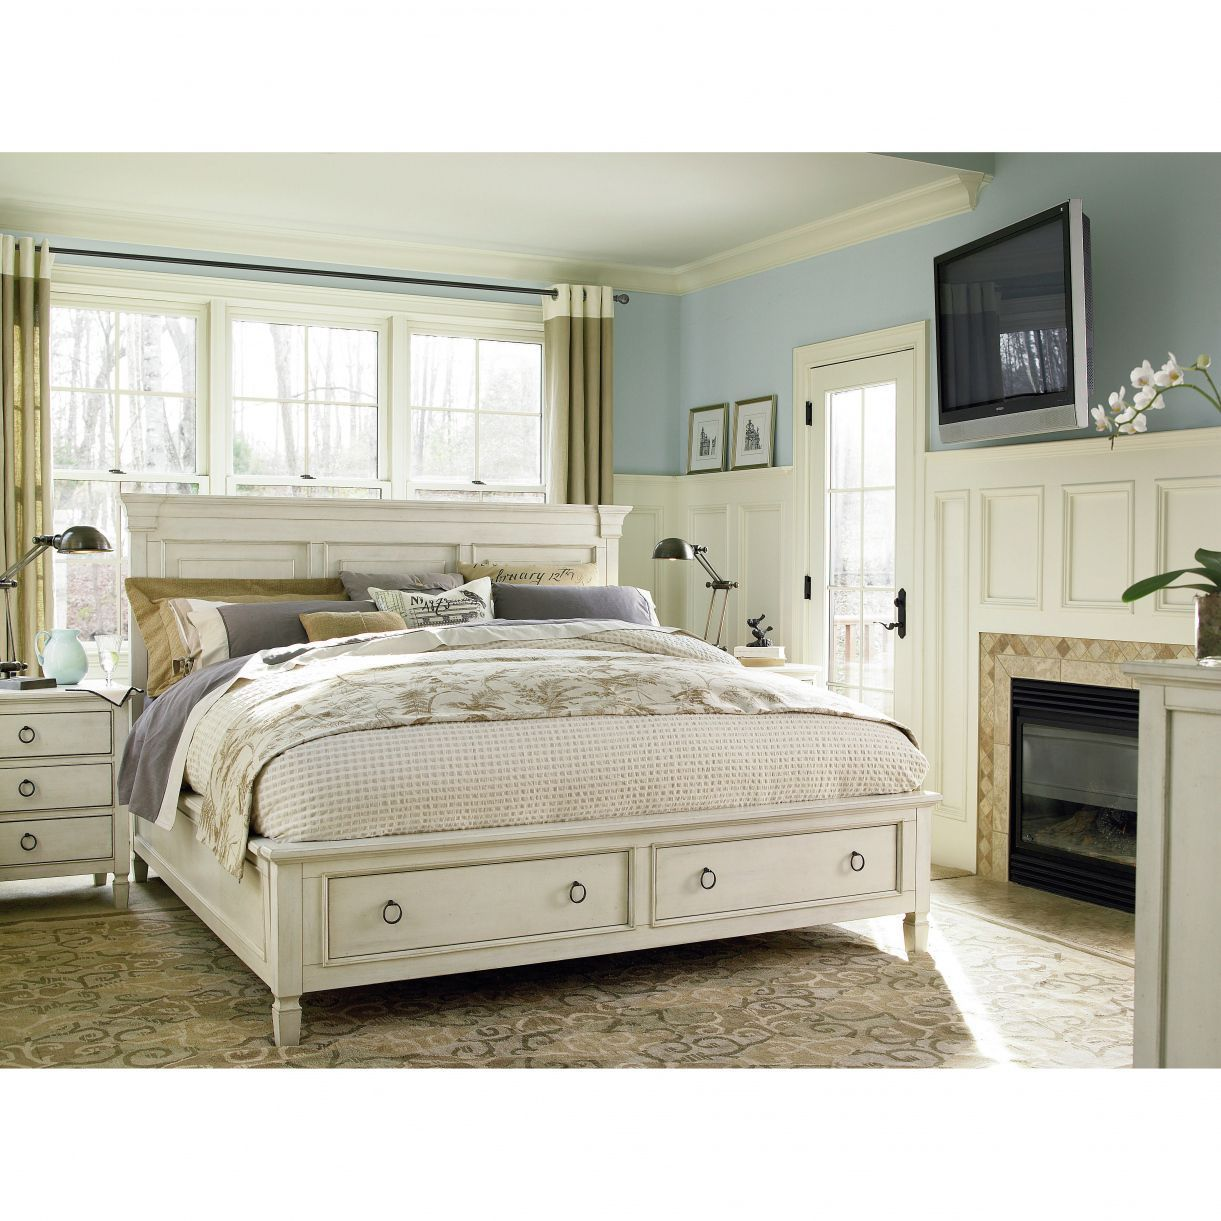 9 Inspired Photo of Wayfair Furniture Bedrooms . Wayfair